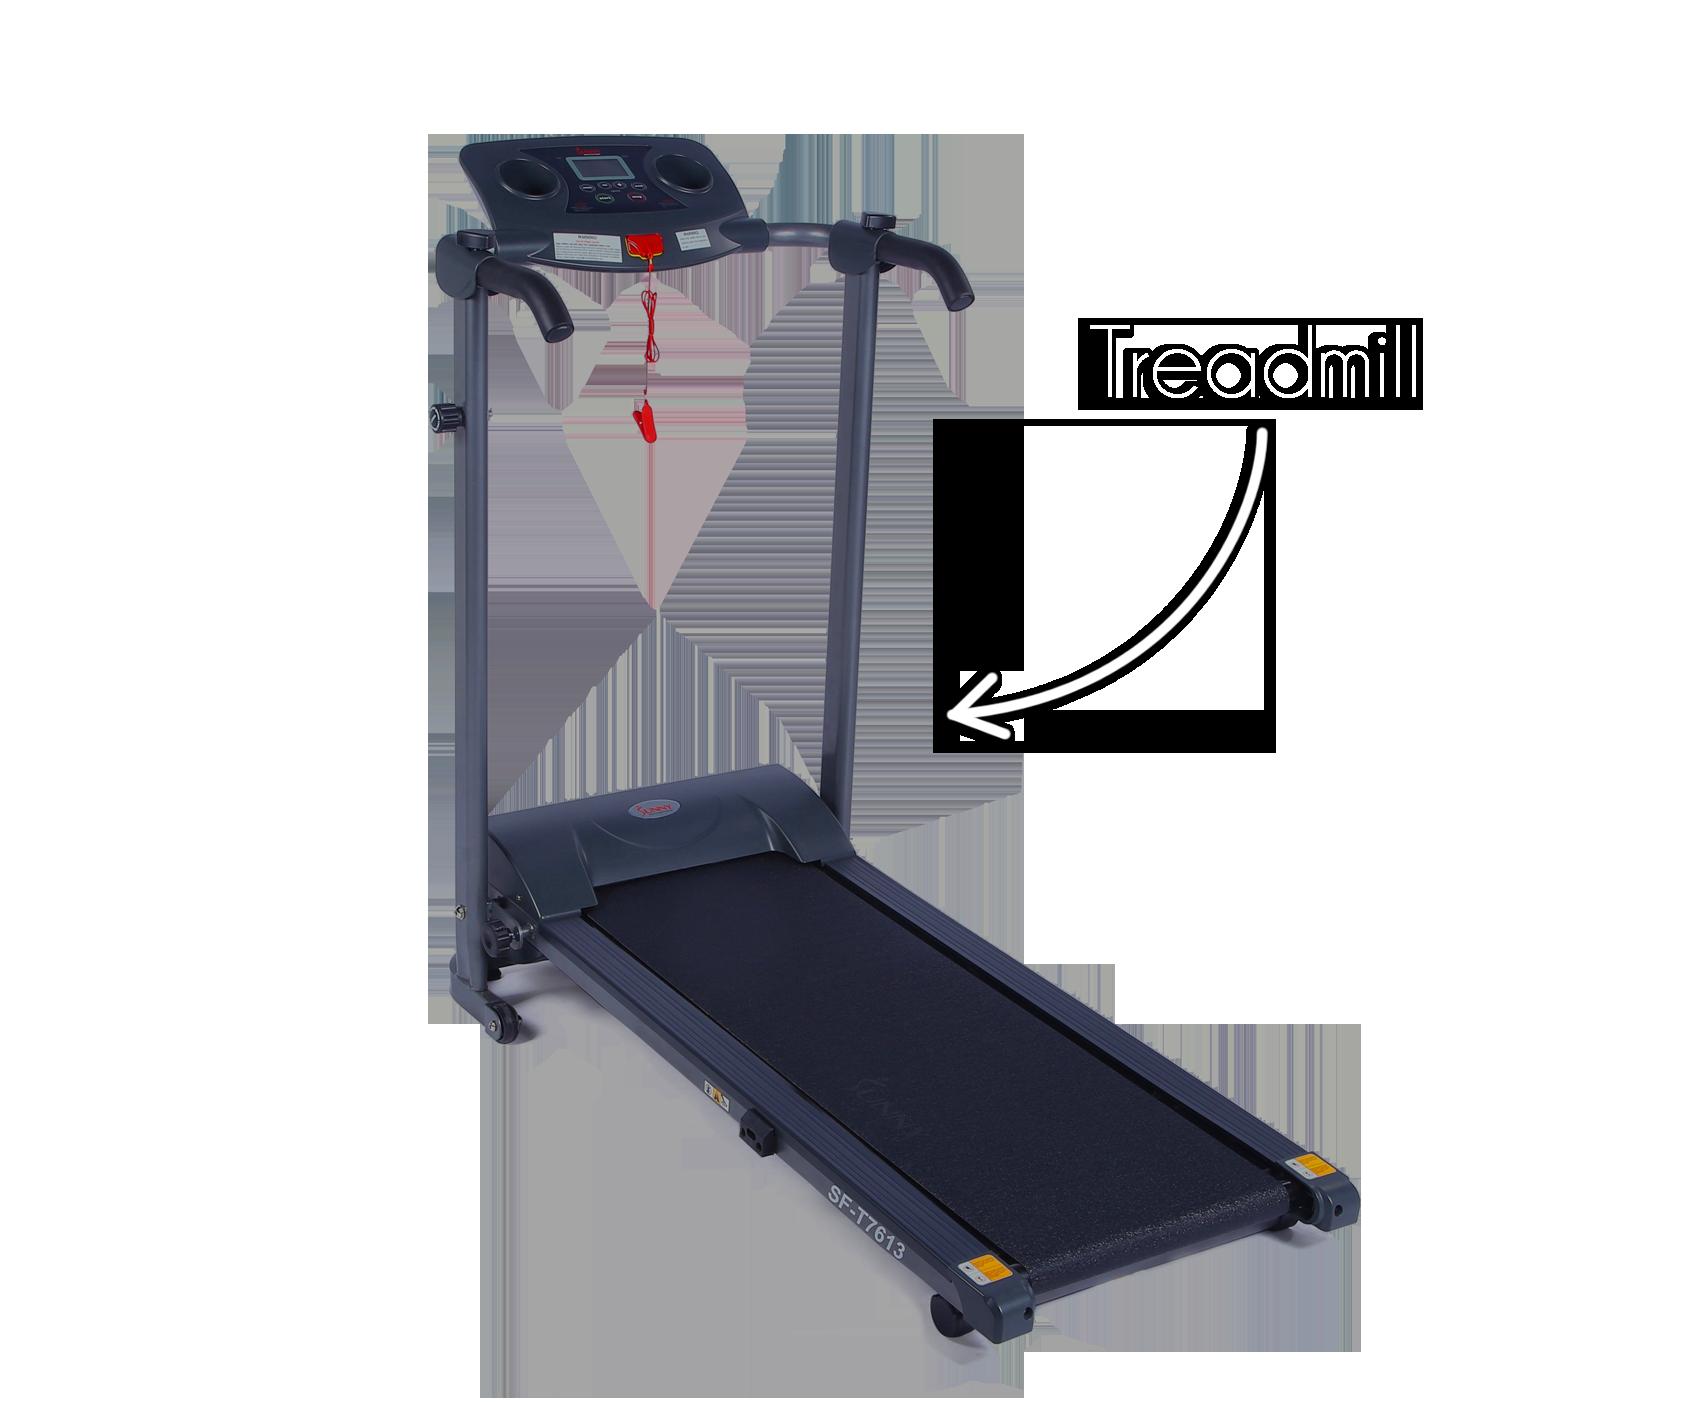 Exercise clipart fitness centre. Gym center